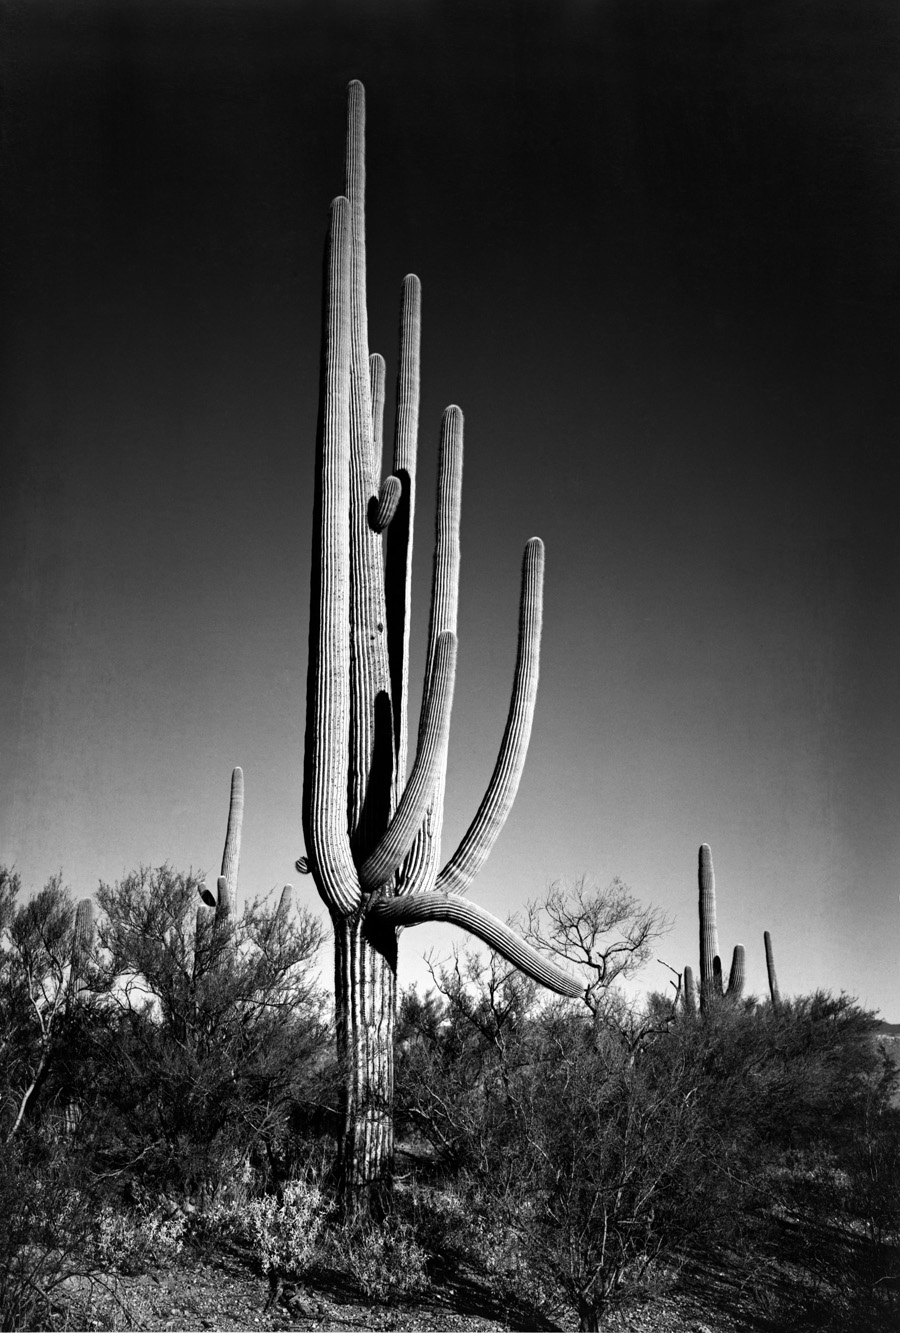 ansel-adams-cactus